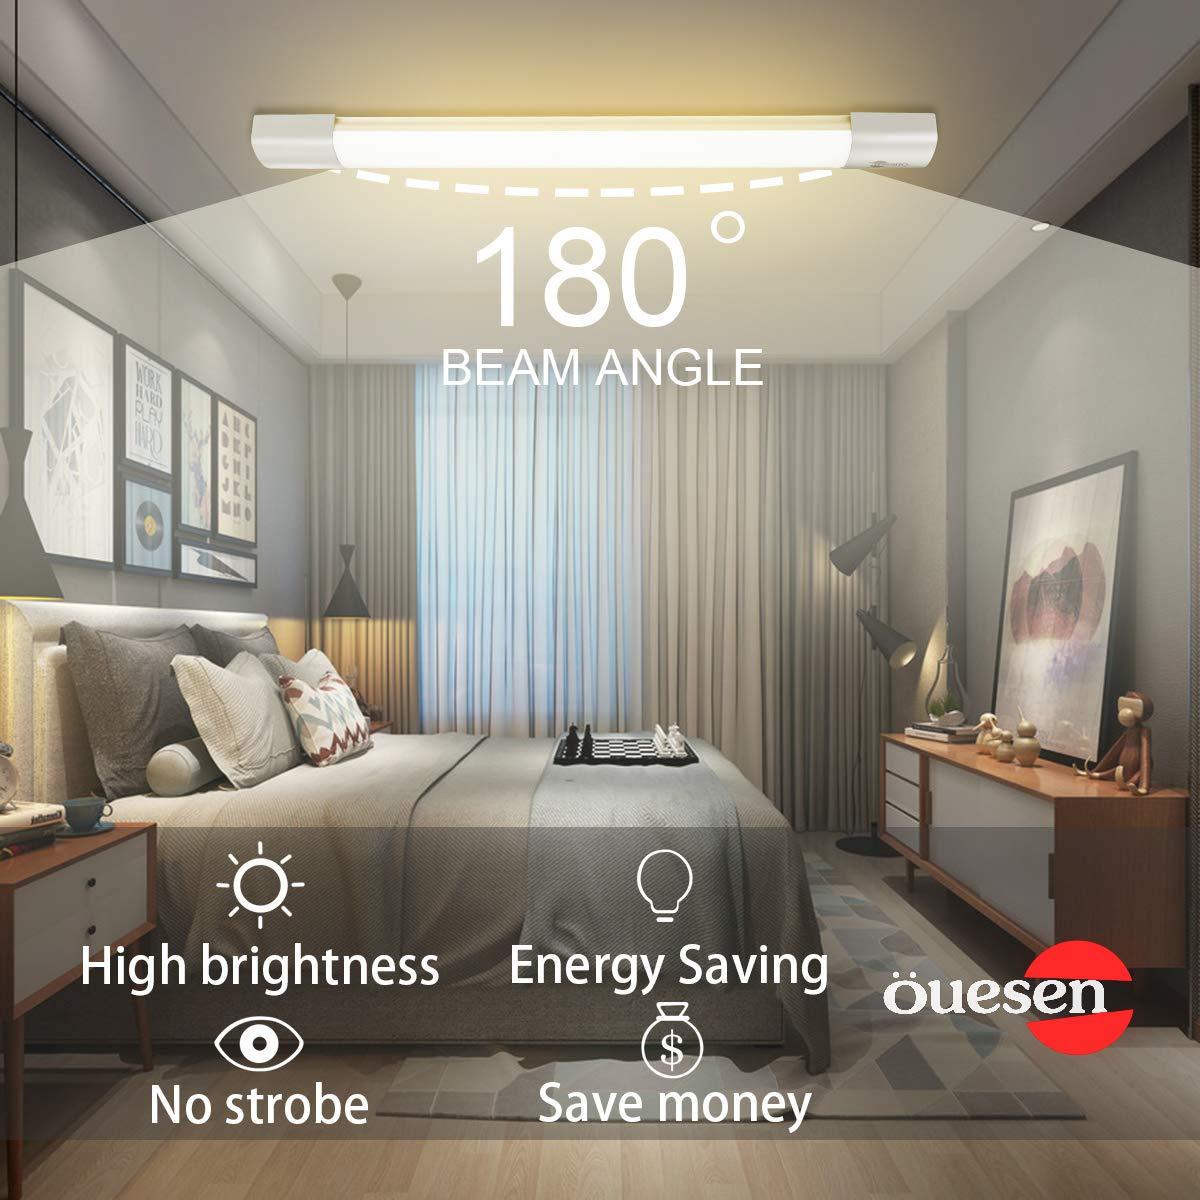 /Öuesen Plafoniere LED 2ft 60CM 180 /° Beam Angle Luci LED impermeabili Raccordo Bianco Naturale 4000K 1800LM Lampada a soffitto per garage Negozio sotterraneo Bagno 18W IP66 LED Tubo Luce